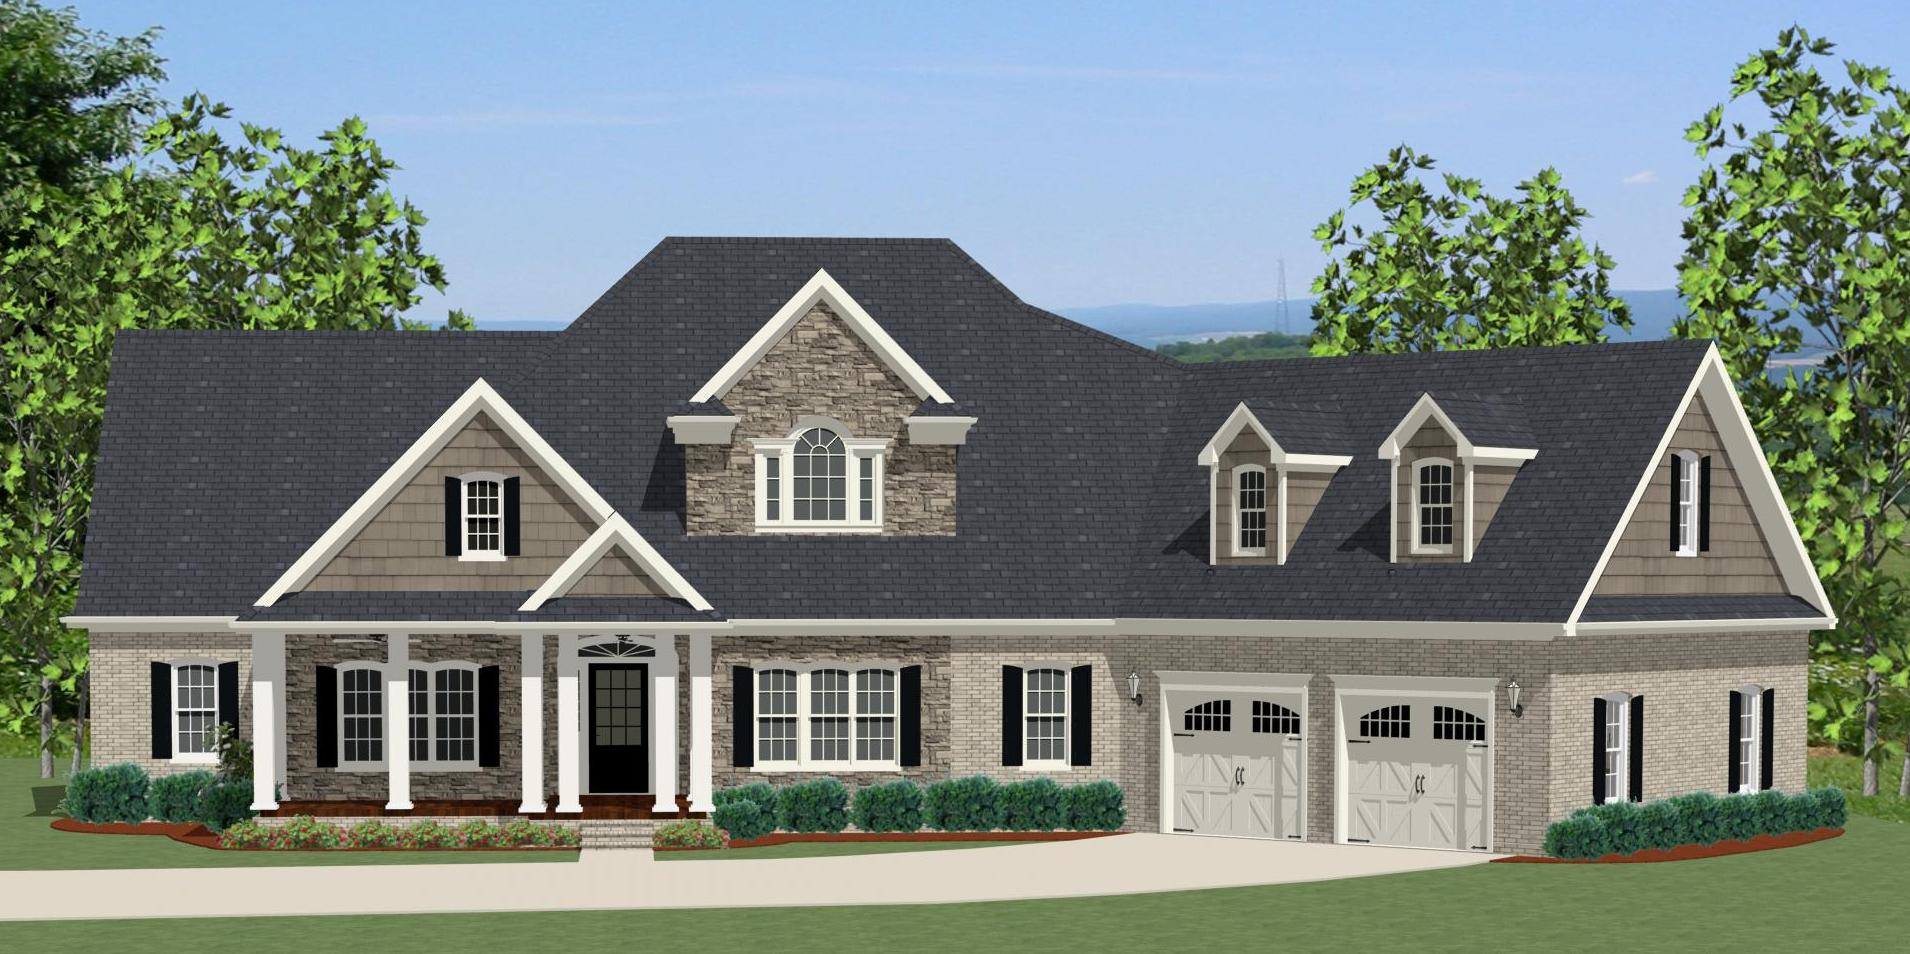 House Plan  1891000 3 Bdrm 2549 Sq Ft Colonial Home